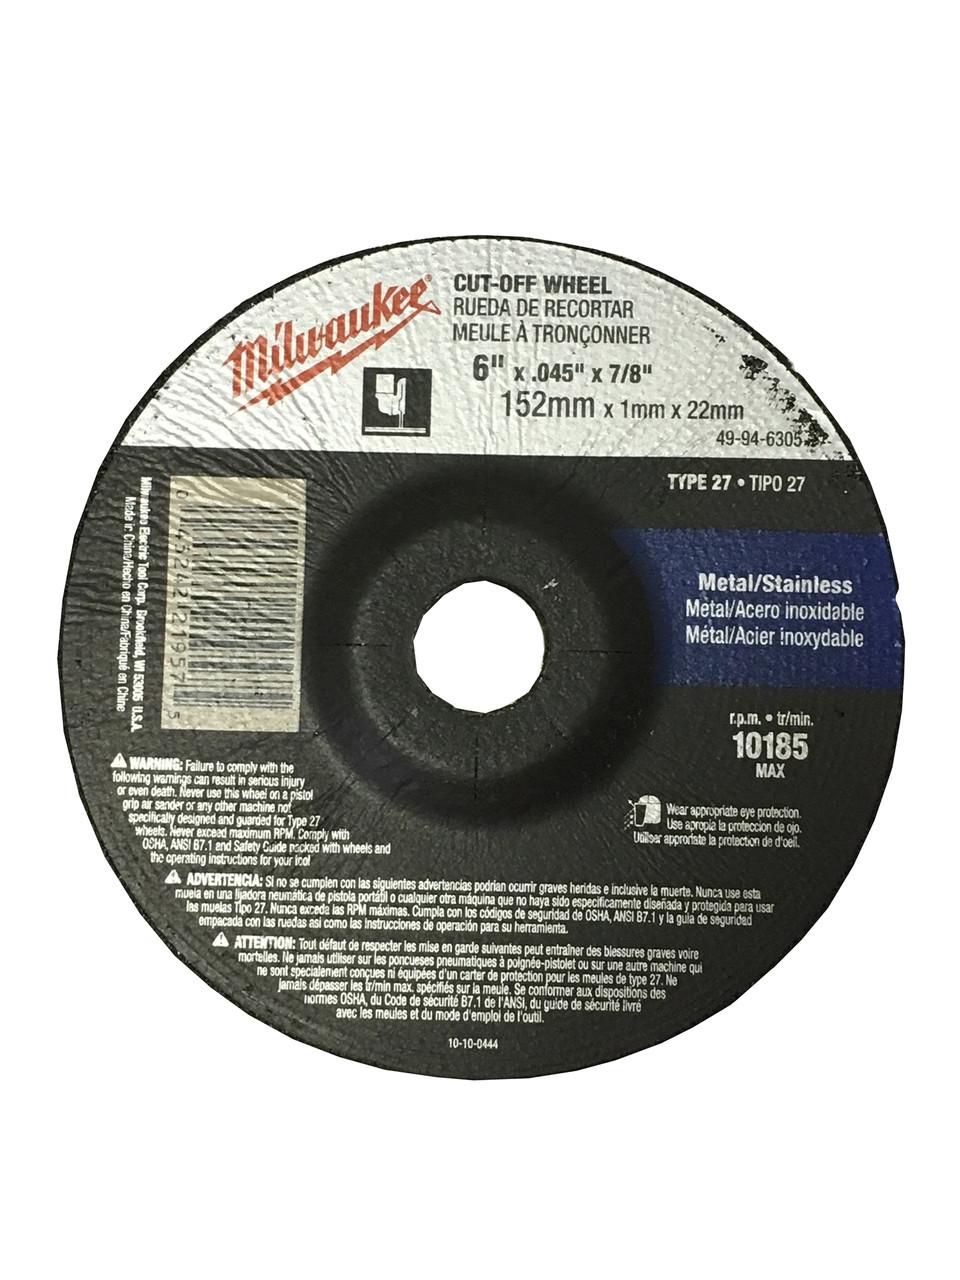 Milwaukee 49-94-6305 6 in x .045 in x 7/8 in Cut-Off Wheel (Type 27)